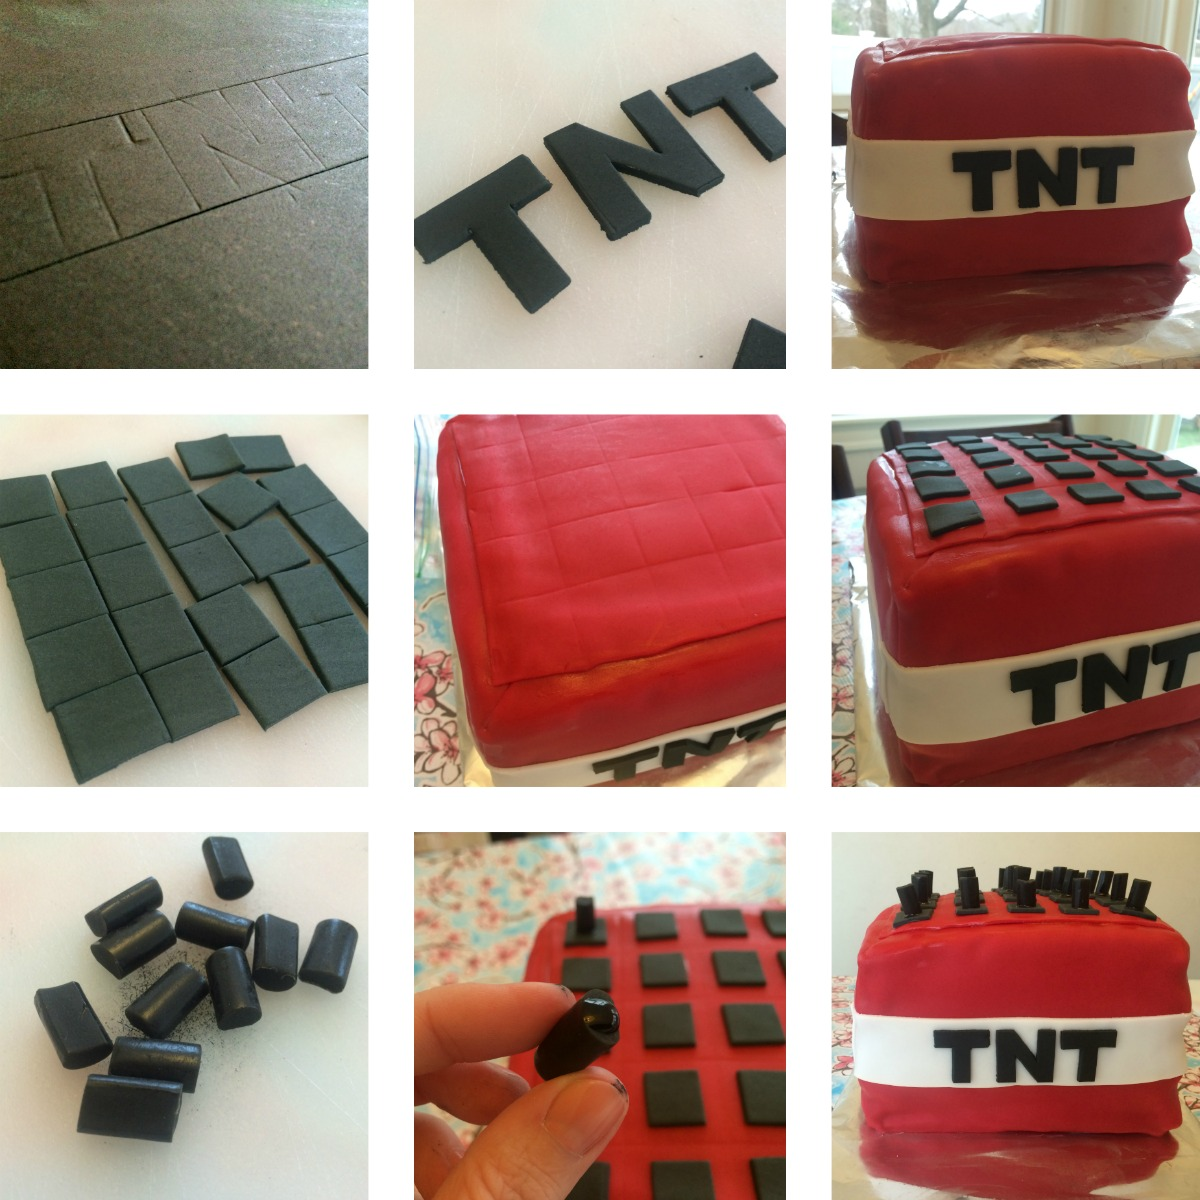 Minecraft TNT Cake Tutorial 5